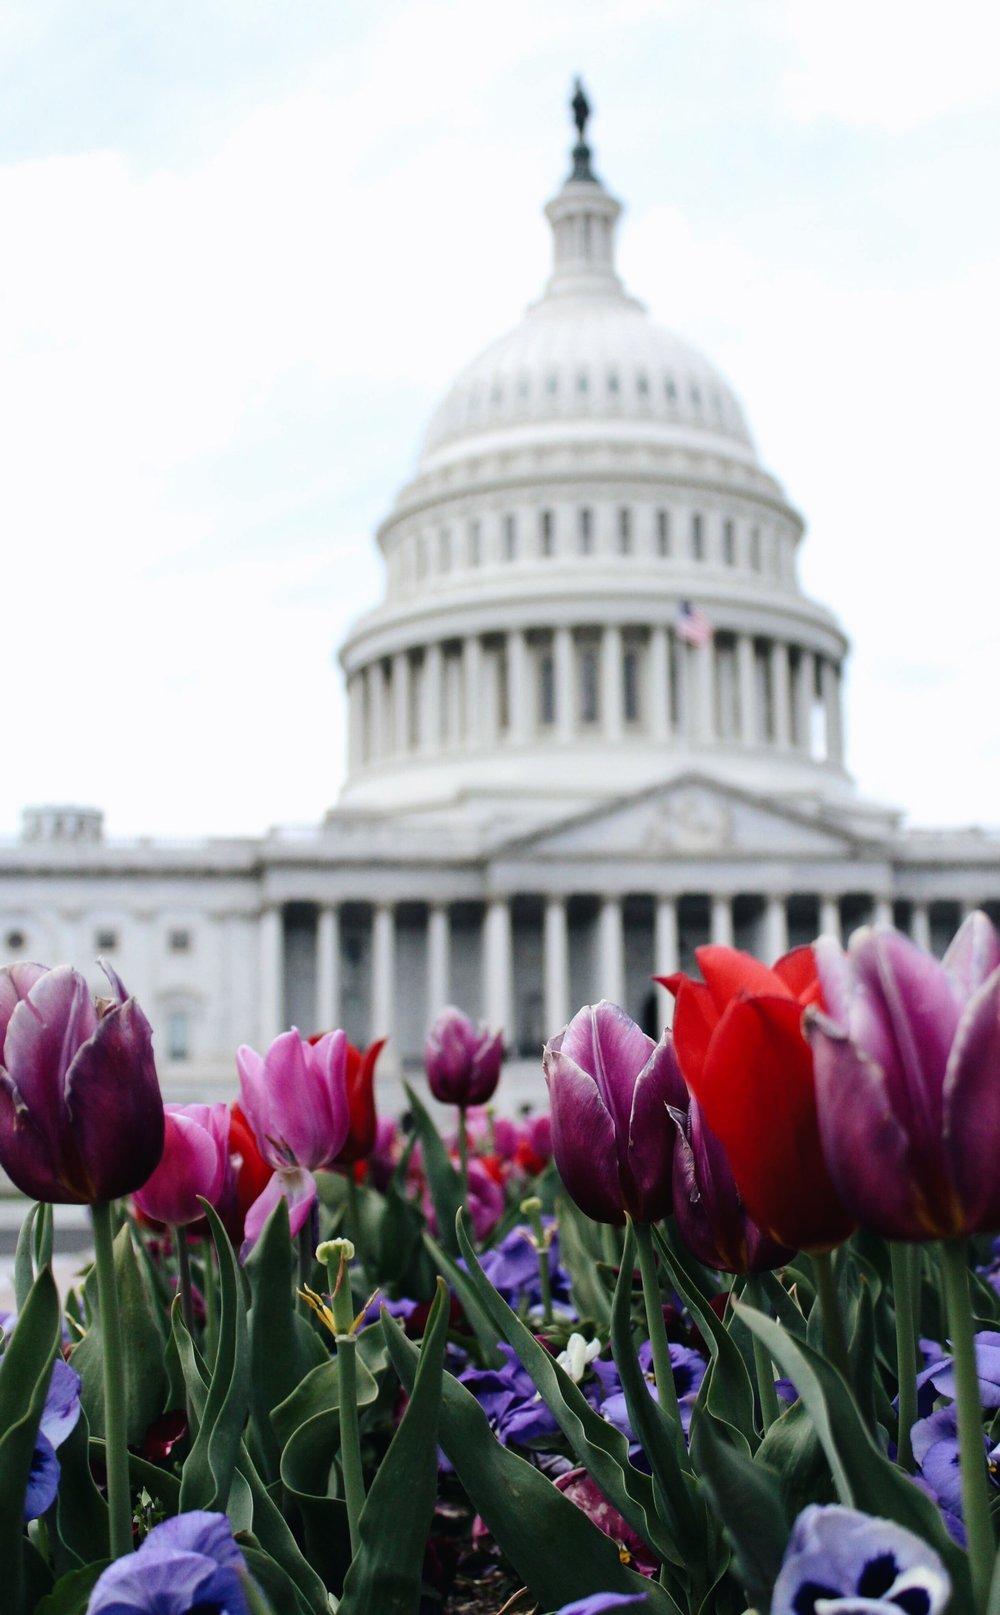 dc condo boutique dupont circle - Washington Capitol with Tulips